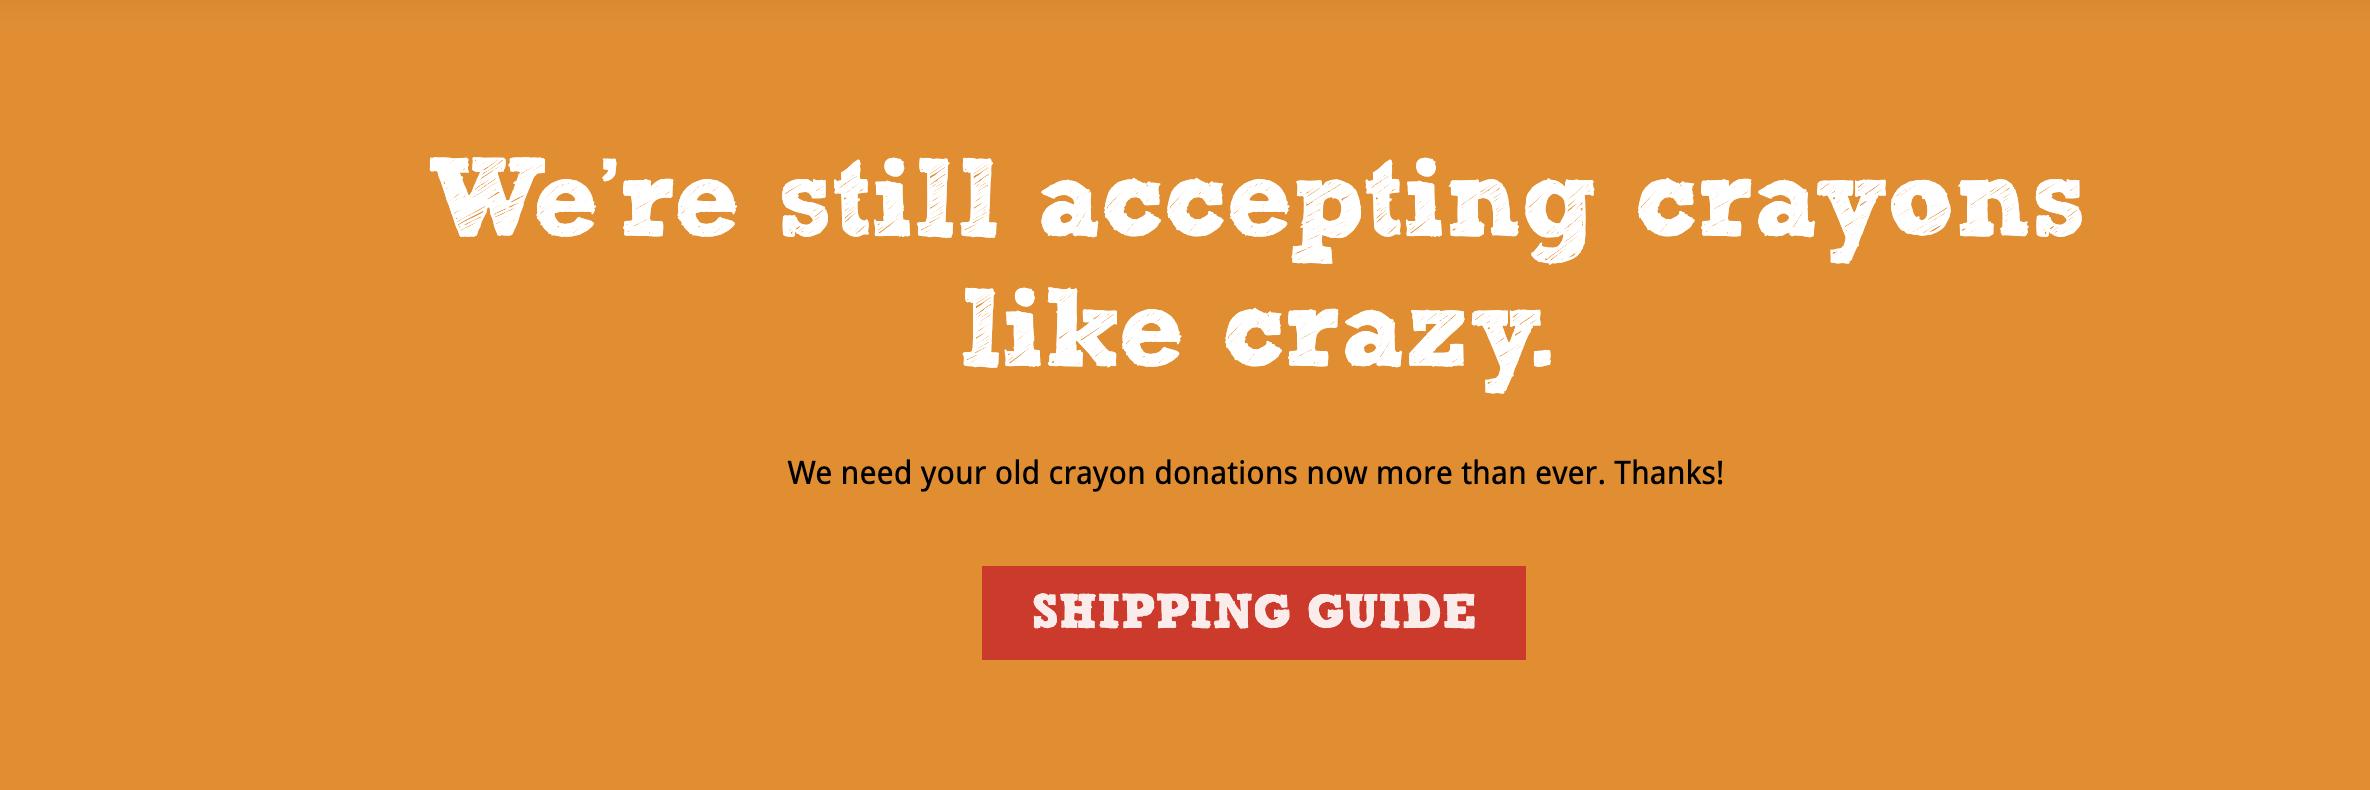 Give Crayons orange background